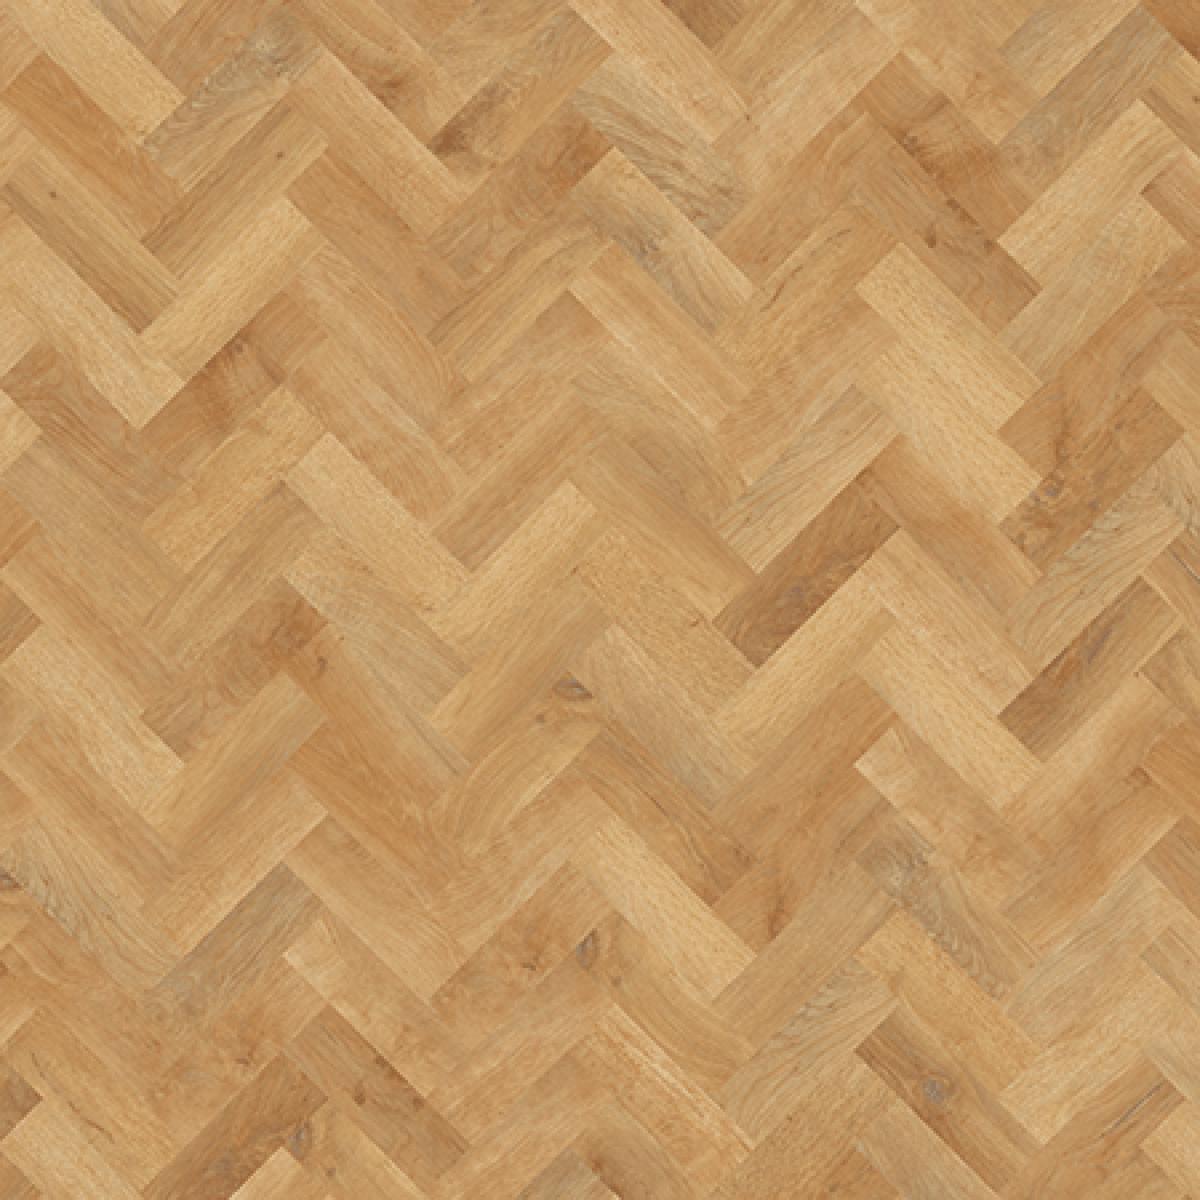 Karndean art select ap01 blond oak parquet blond luxury vinyl karndean ap01 blond oak parquet art select flooring dailygadgetfo Image collections